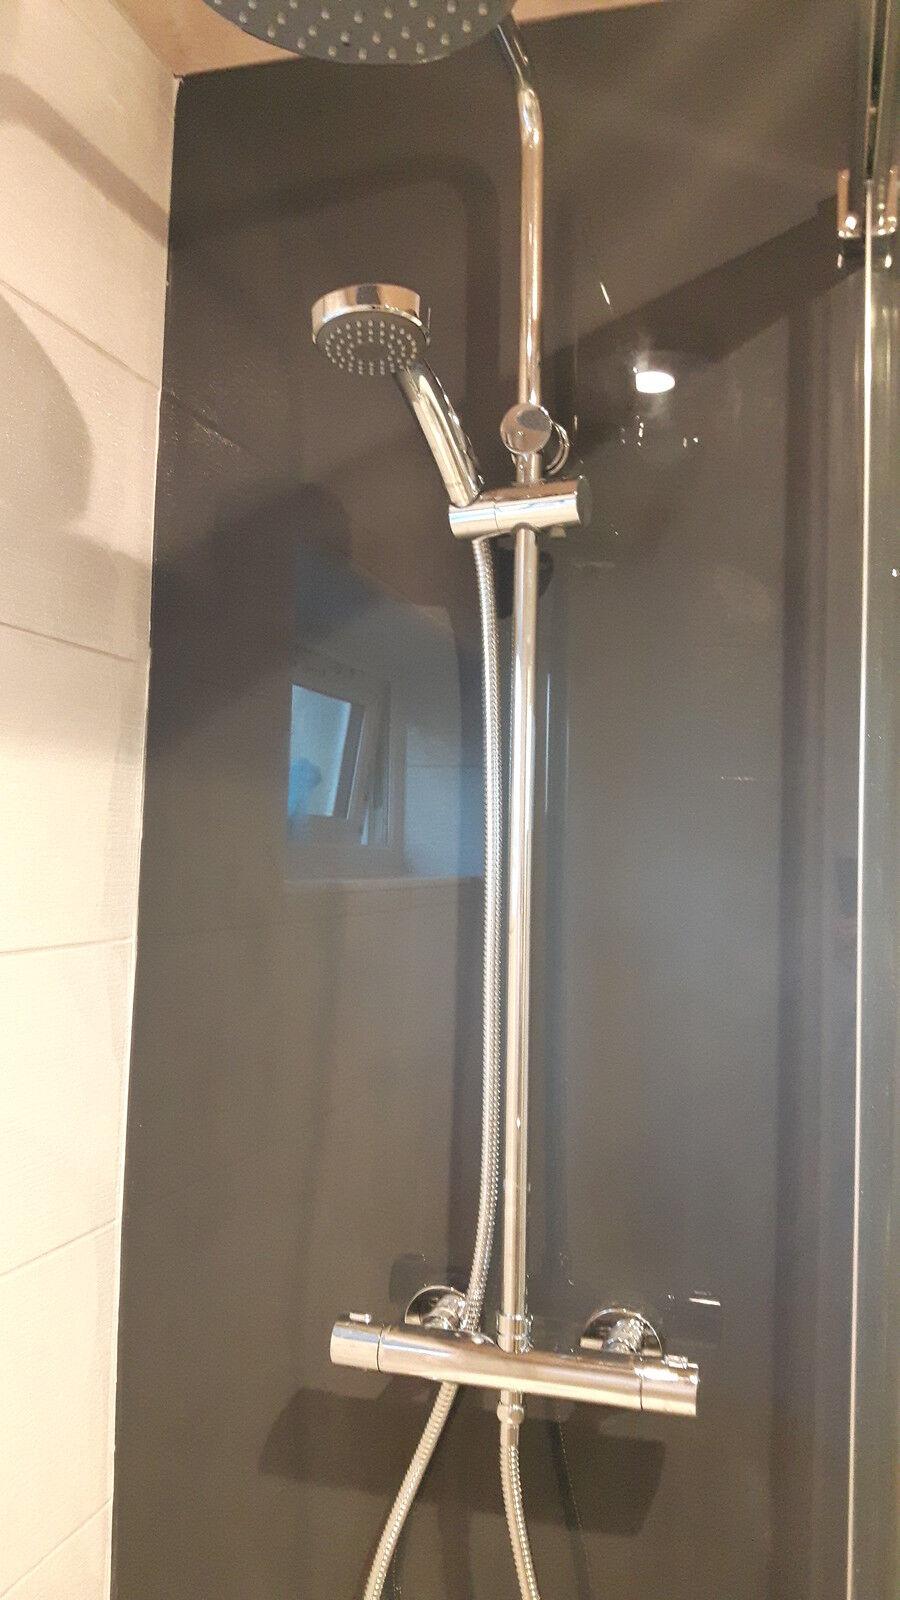 Bathroom Splash Back Shower Wall Decorative Acrylic